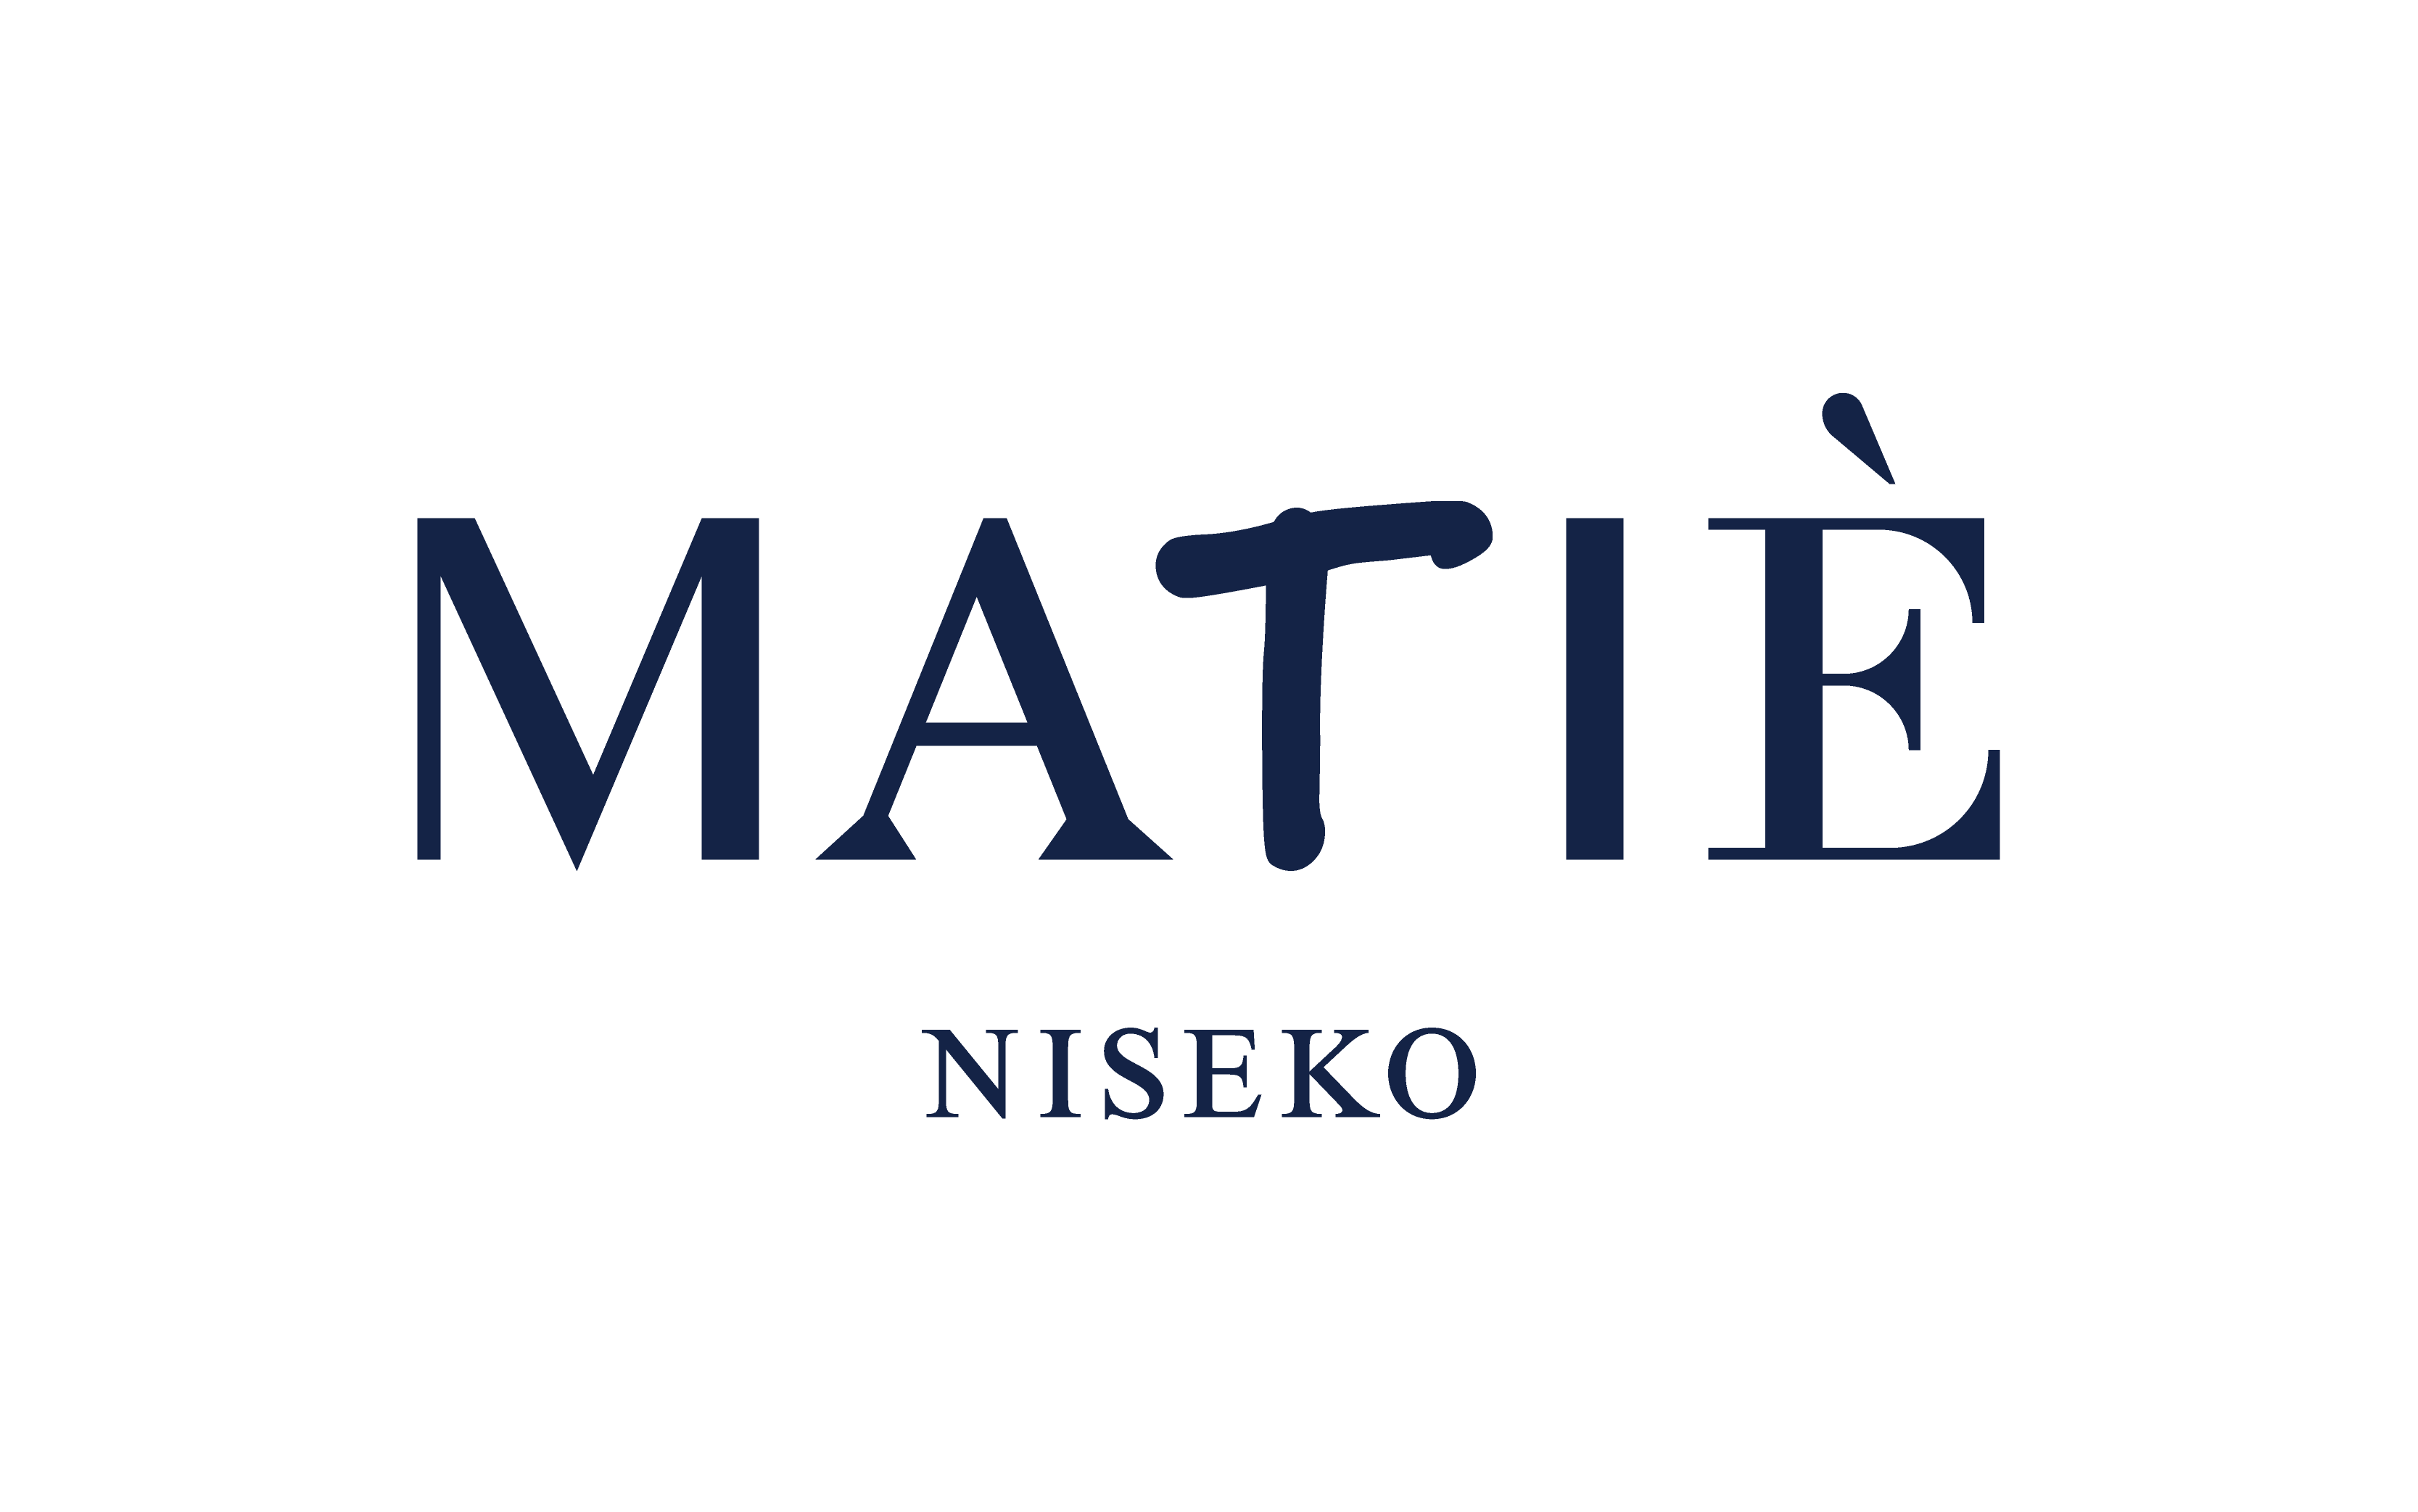 MATIE logo 09